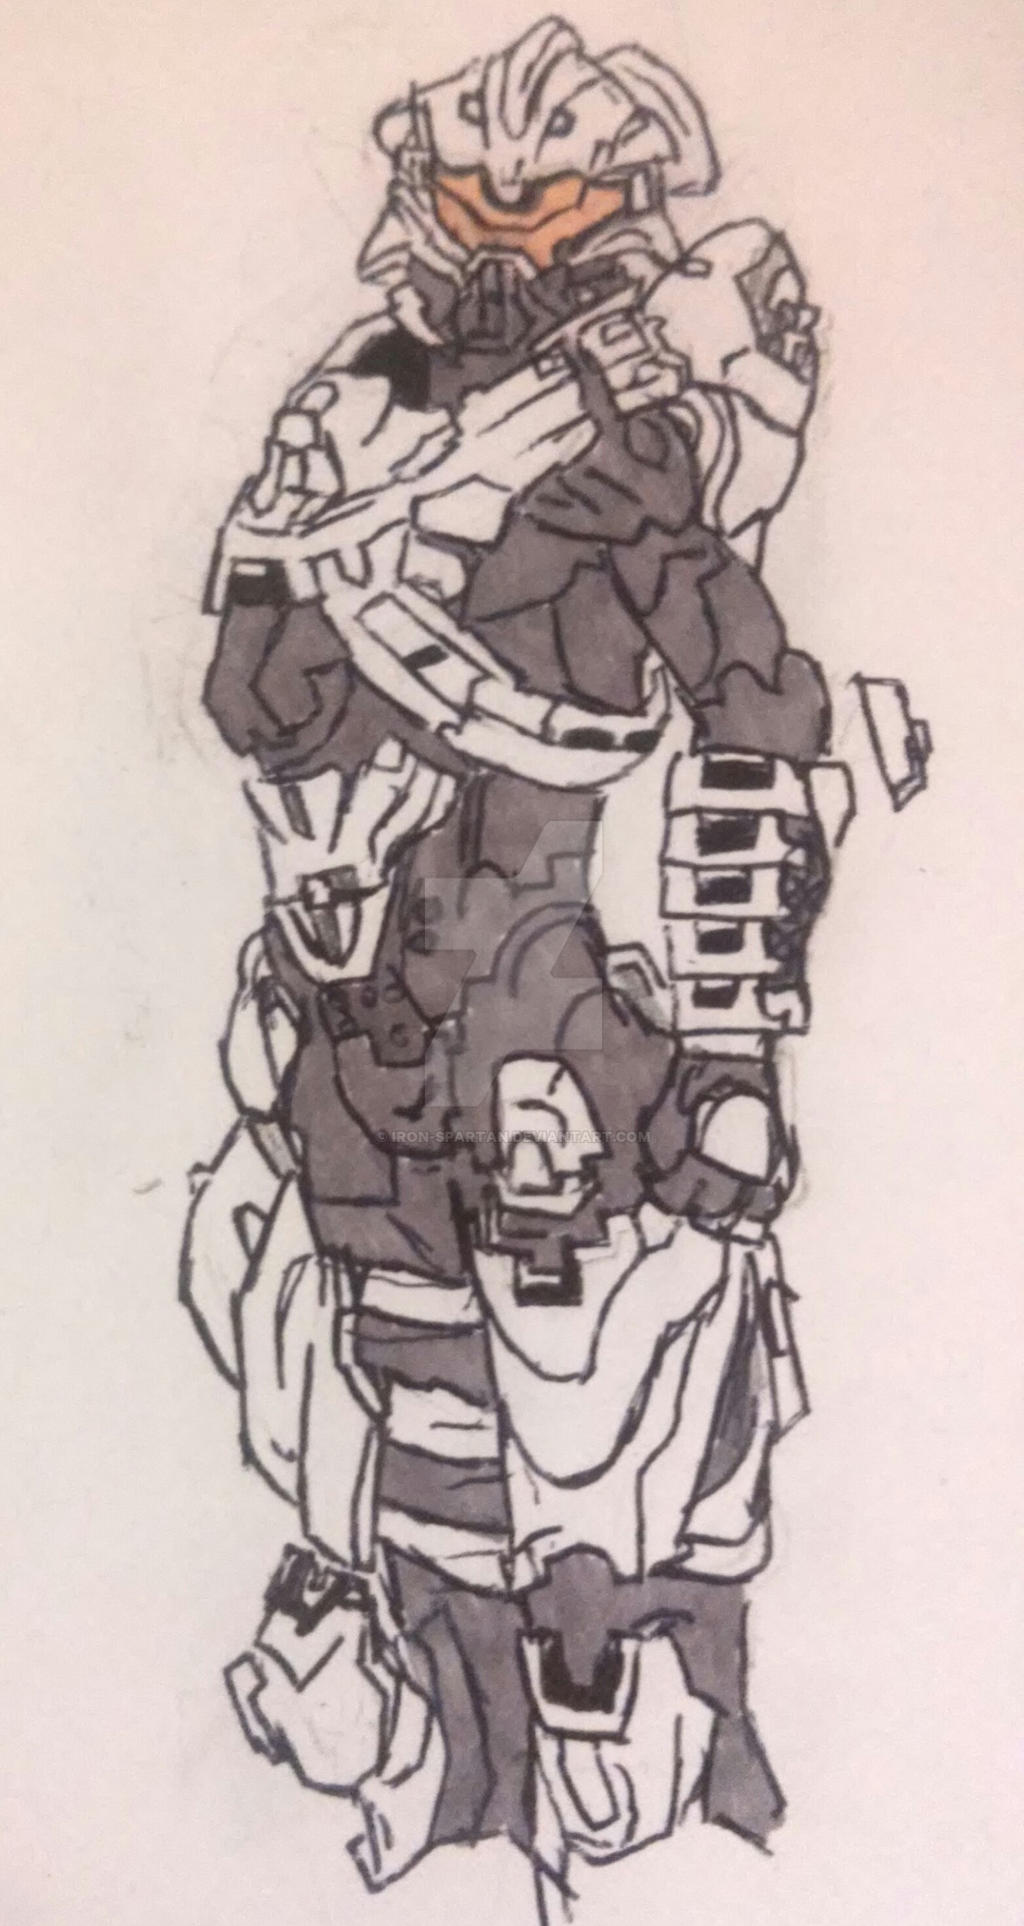 Halo 5 Guardians Helioskrill armor sketch by iron-spartan ...